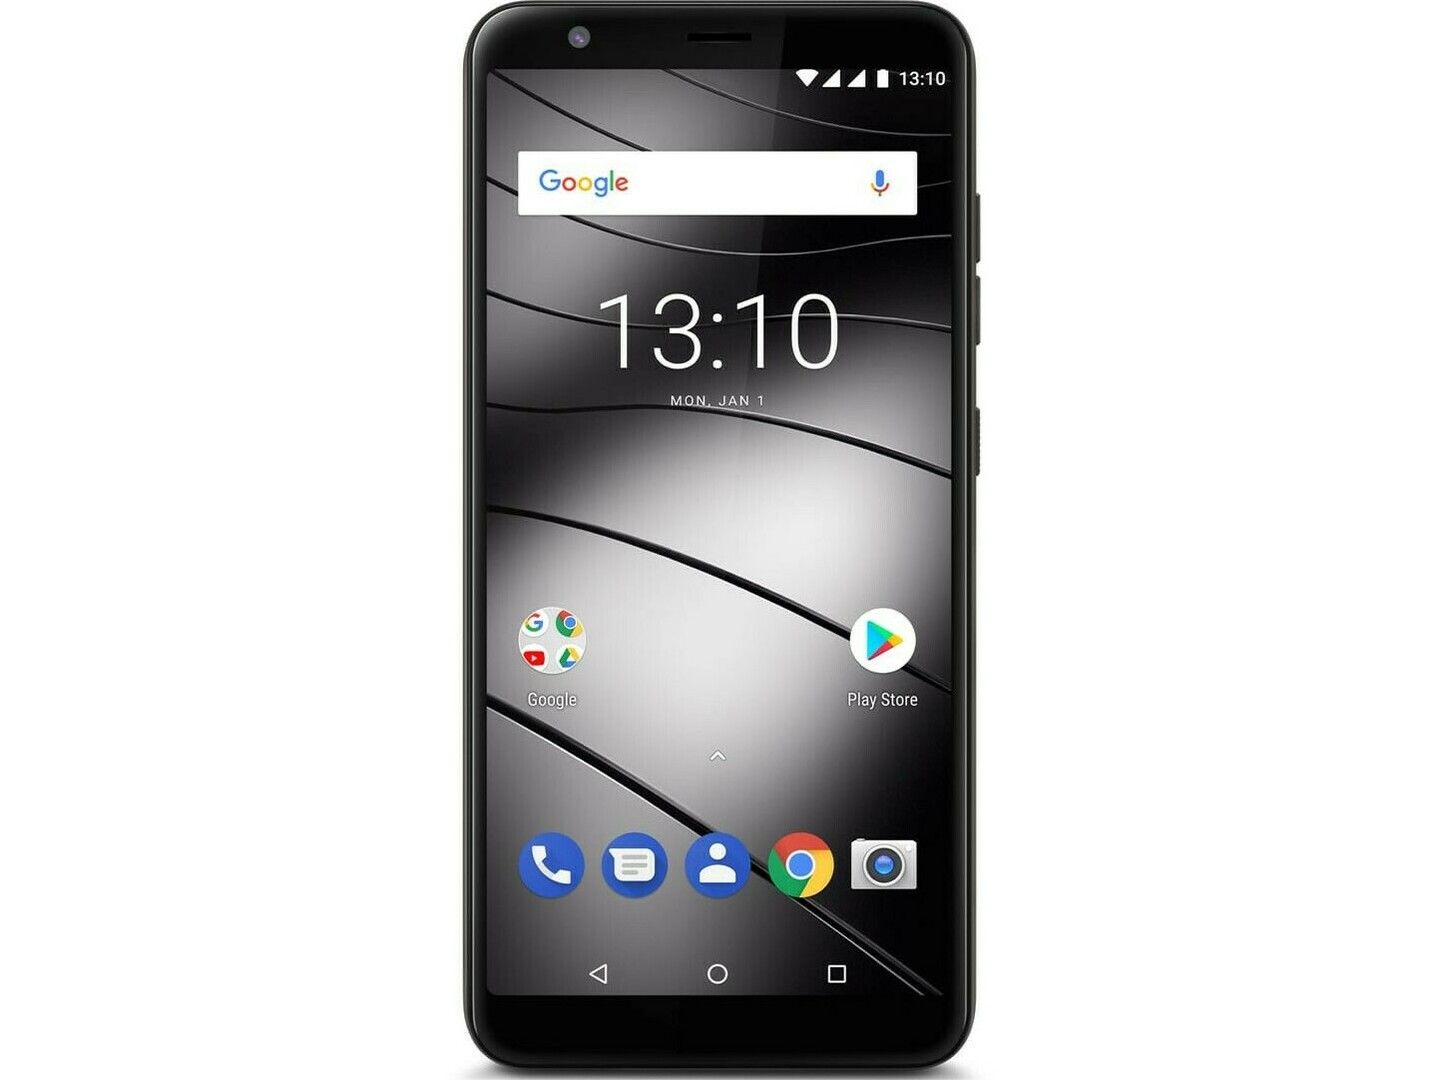 Gigaset Gs280 Smartphone Review Notebookcheck Net Reviews